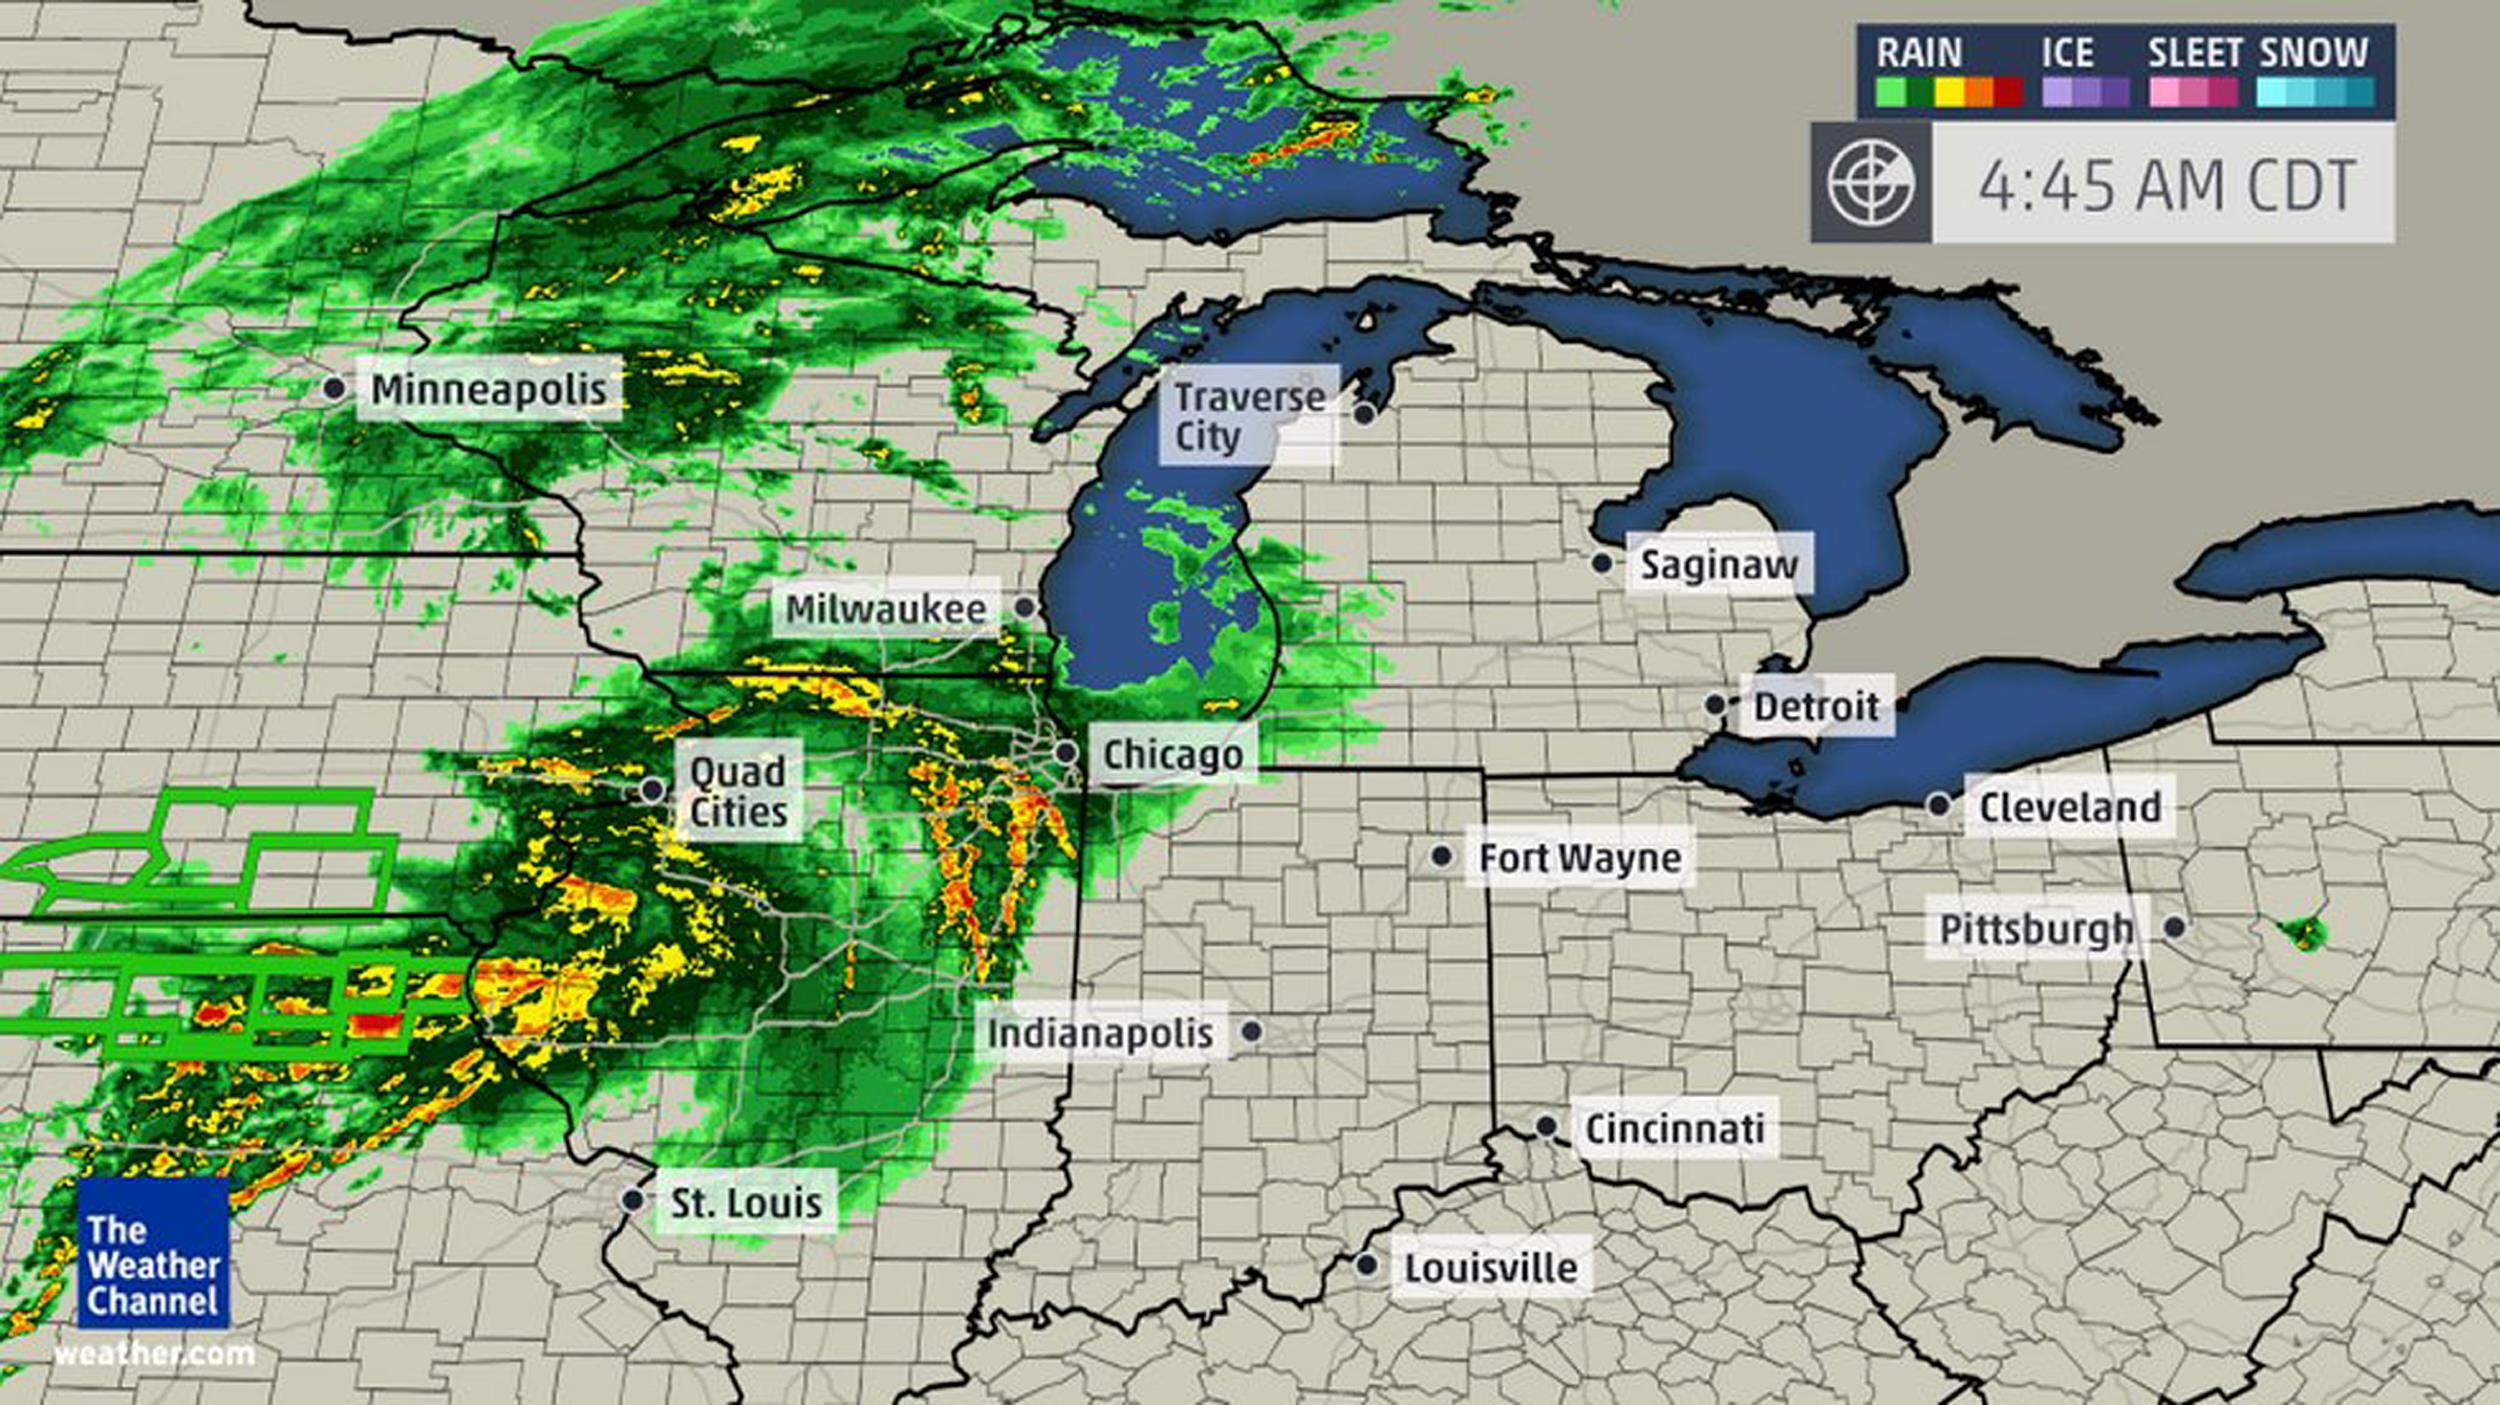 weather channel radar in motion michigan